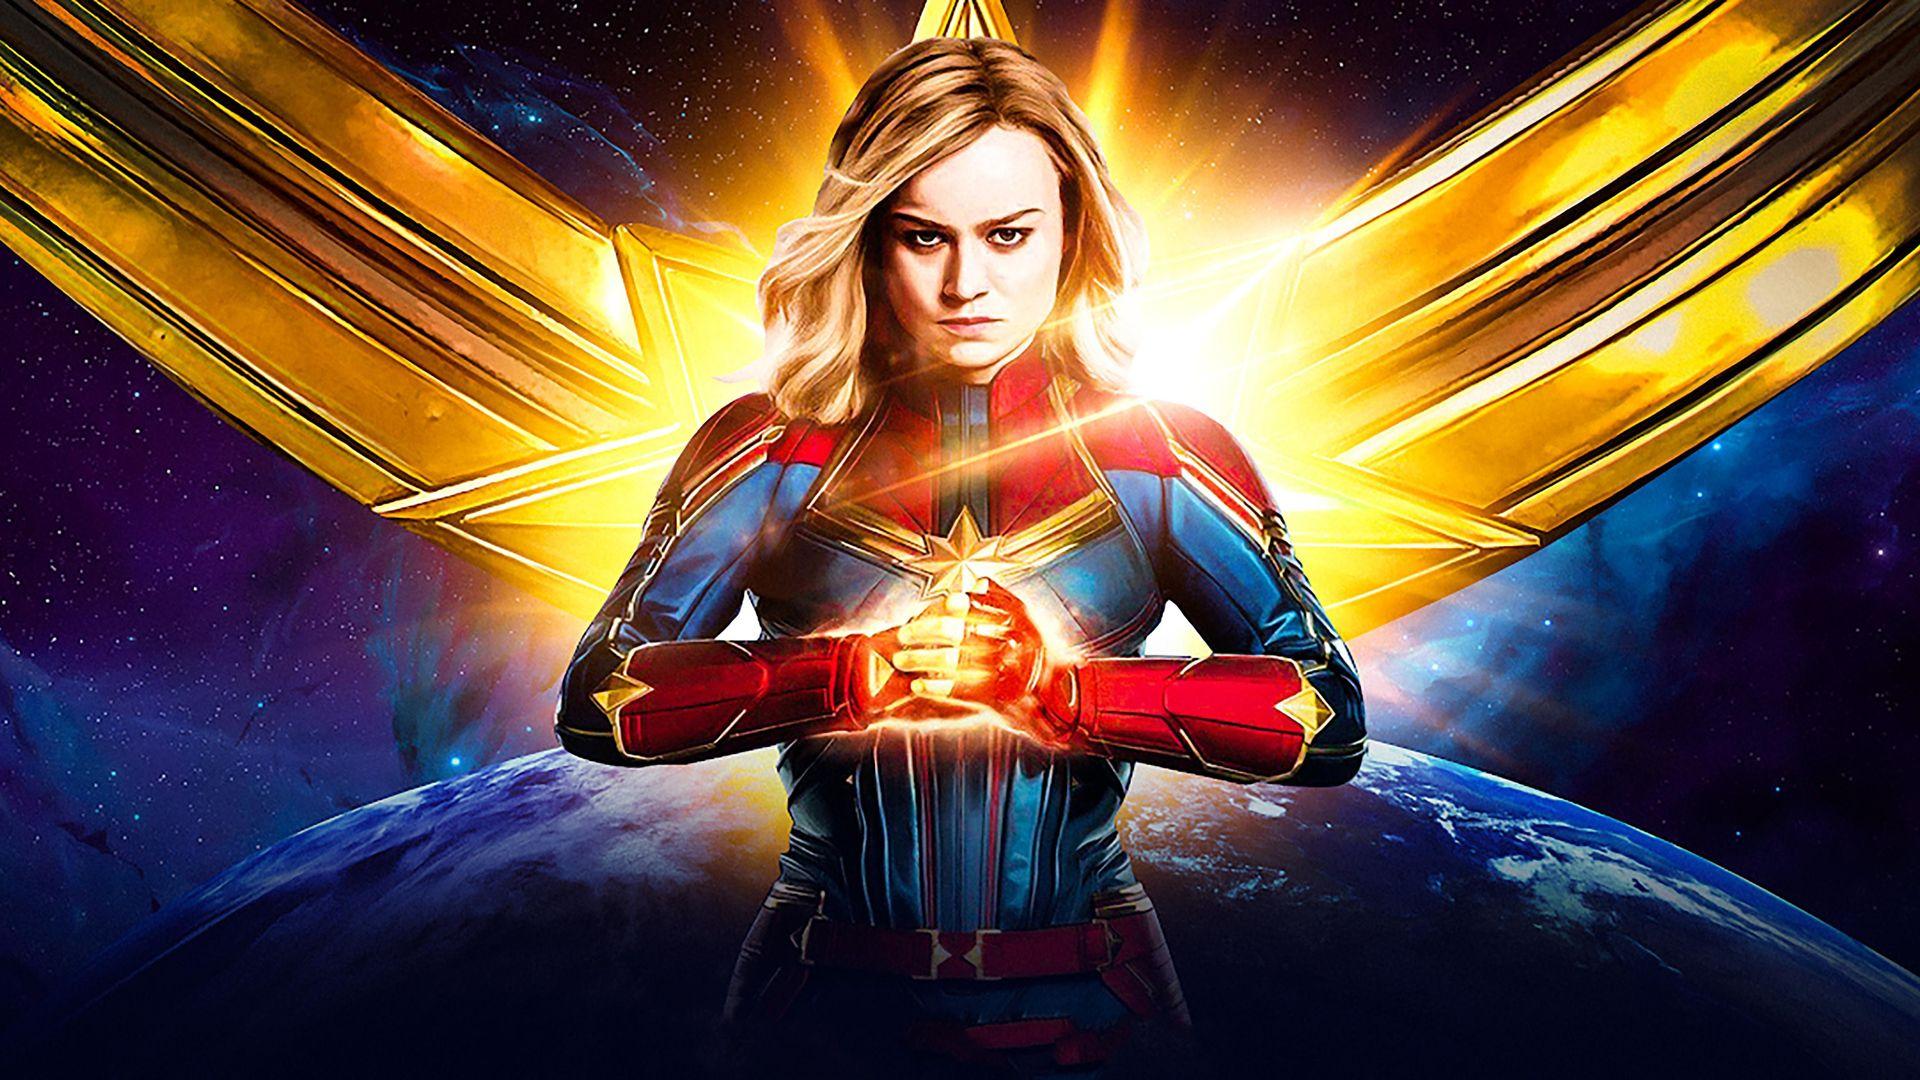 Captain Marvel Cool HD Wallpaper